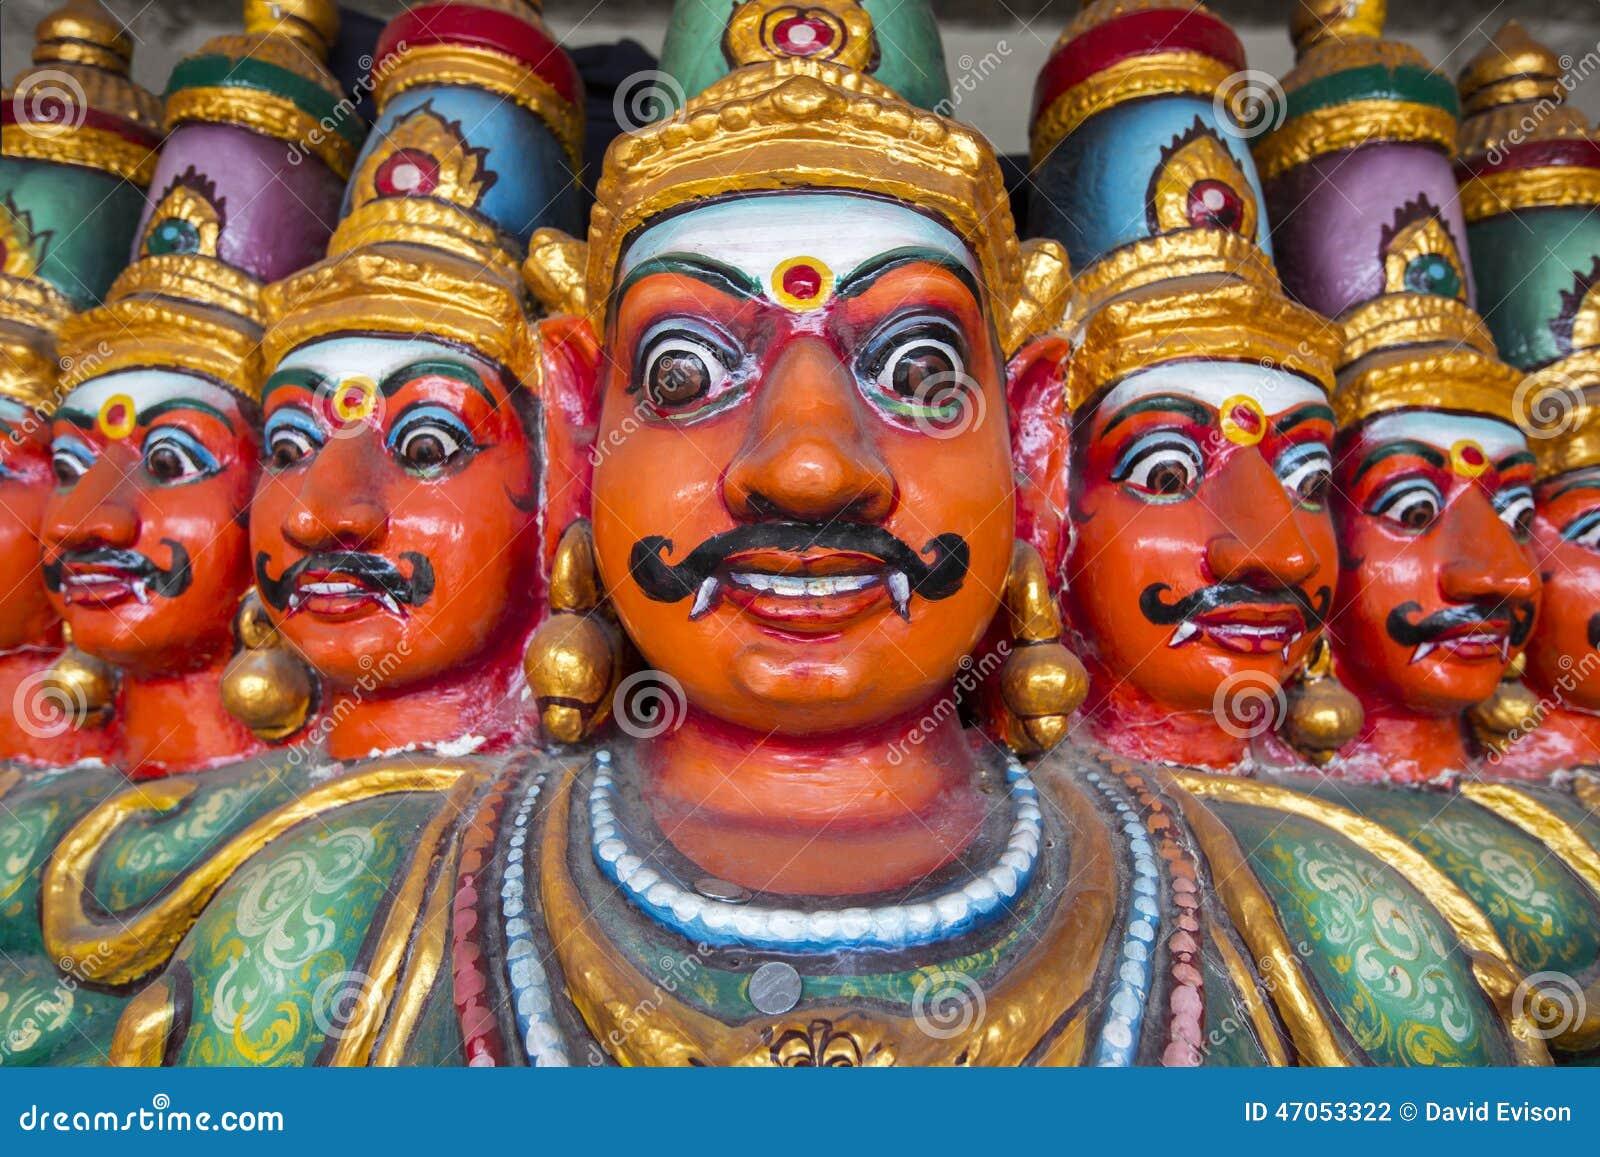 Ravana Stock Images Download 1316 Royalty Free Photos